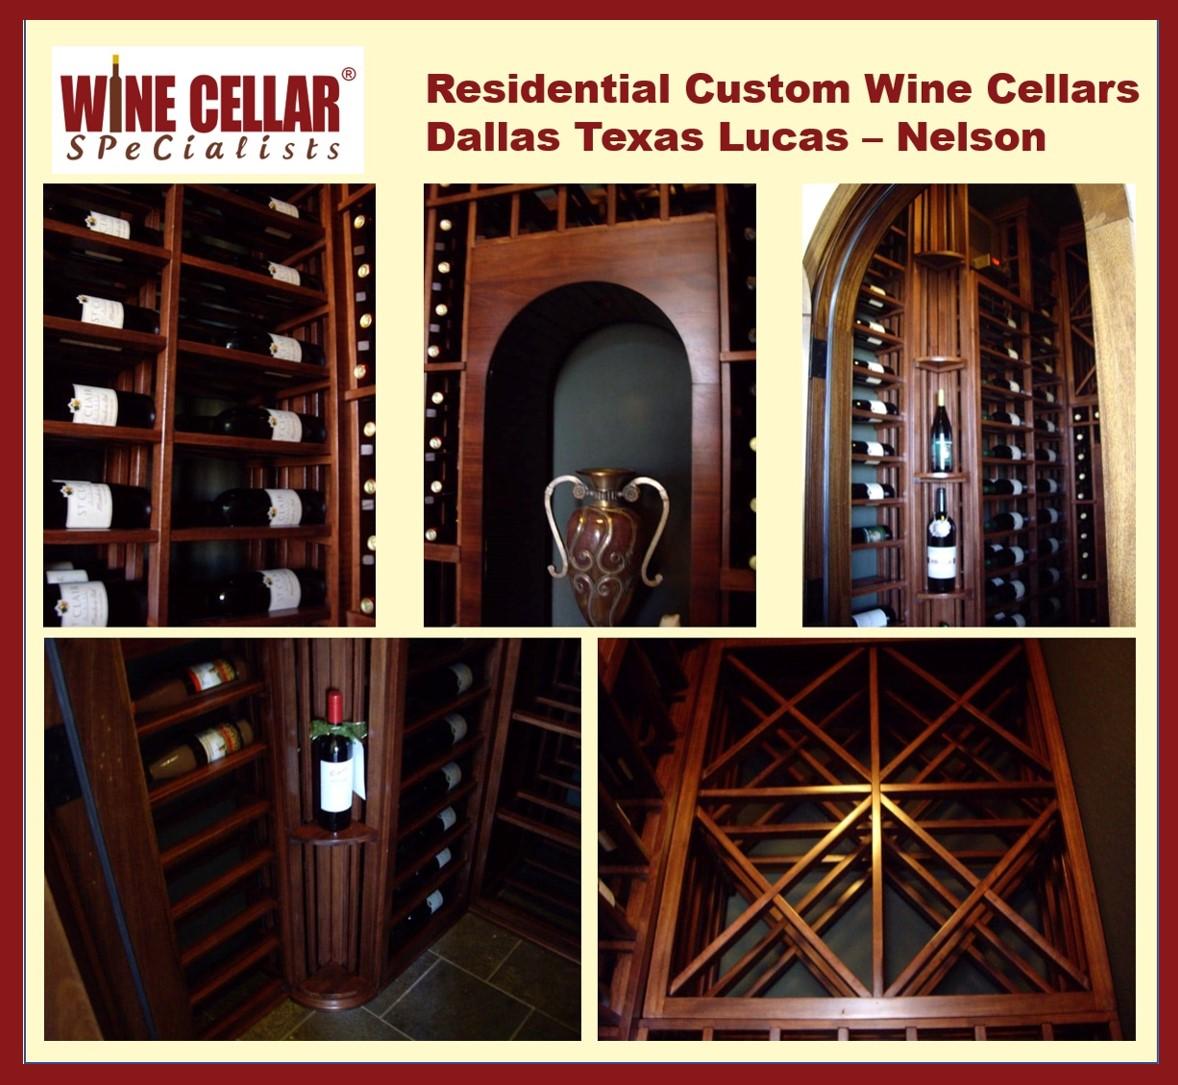 Residential Wine Cellar Dallas Lucas – Nelson.jpg